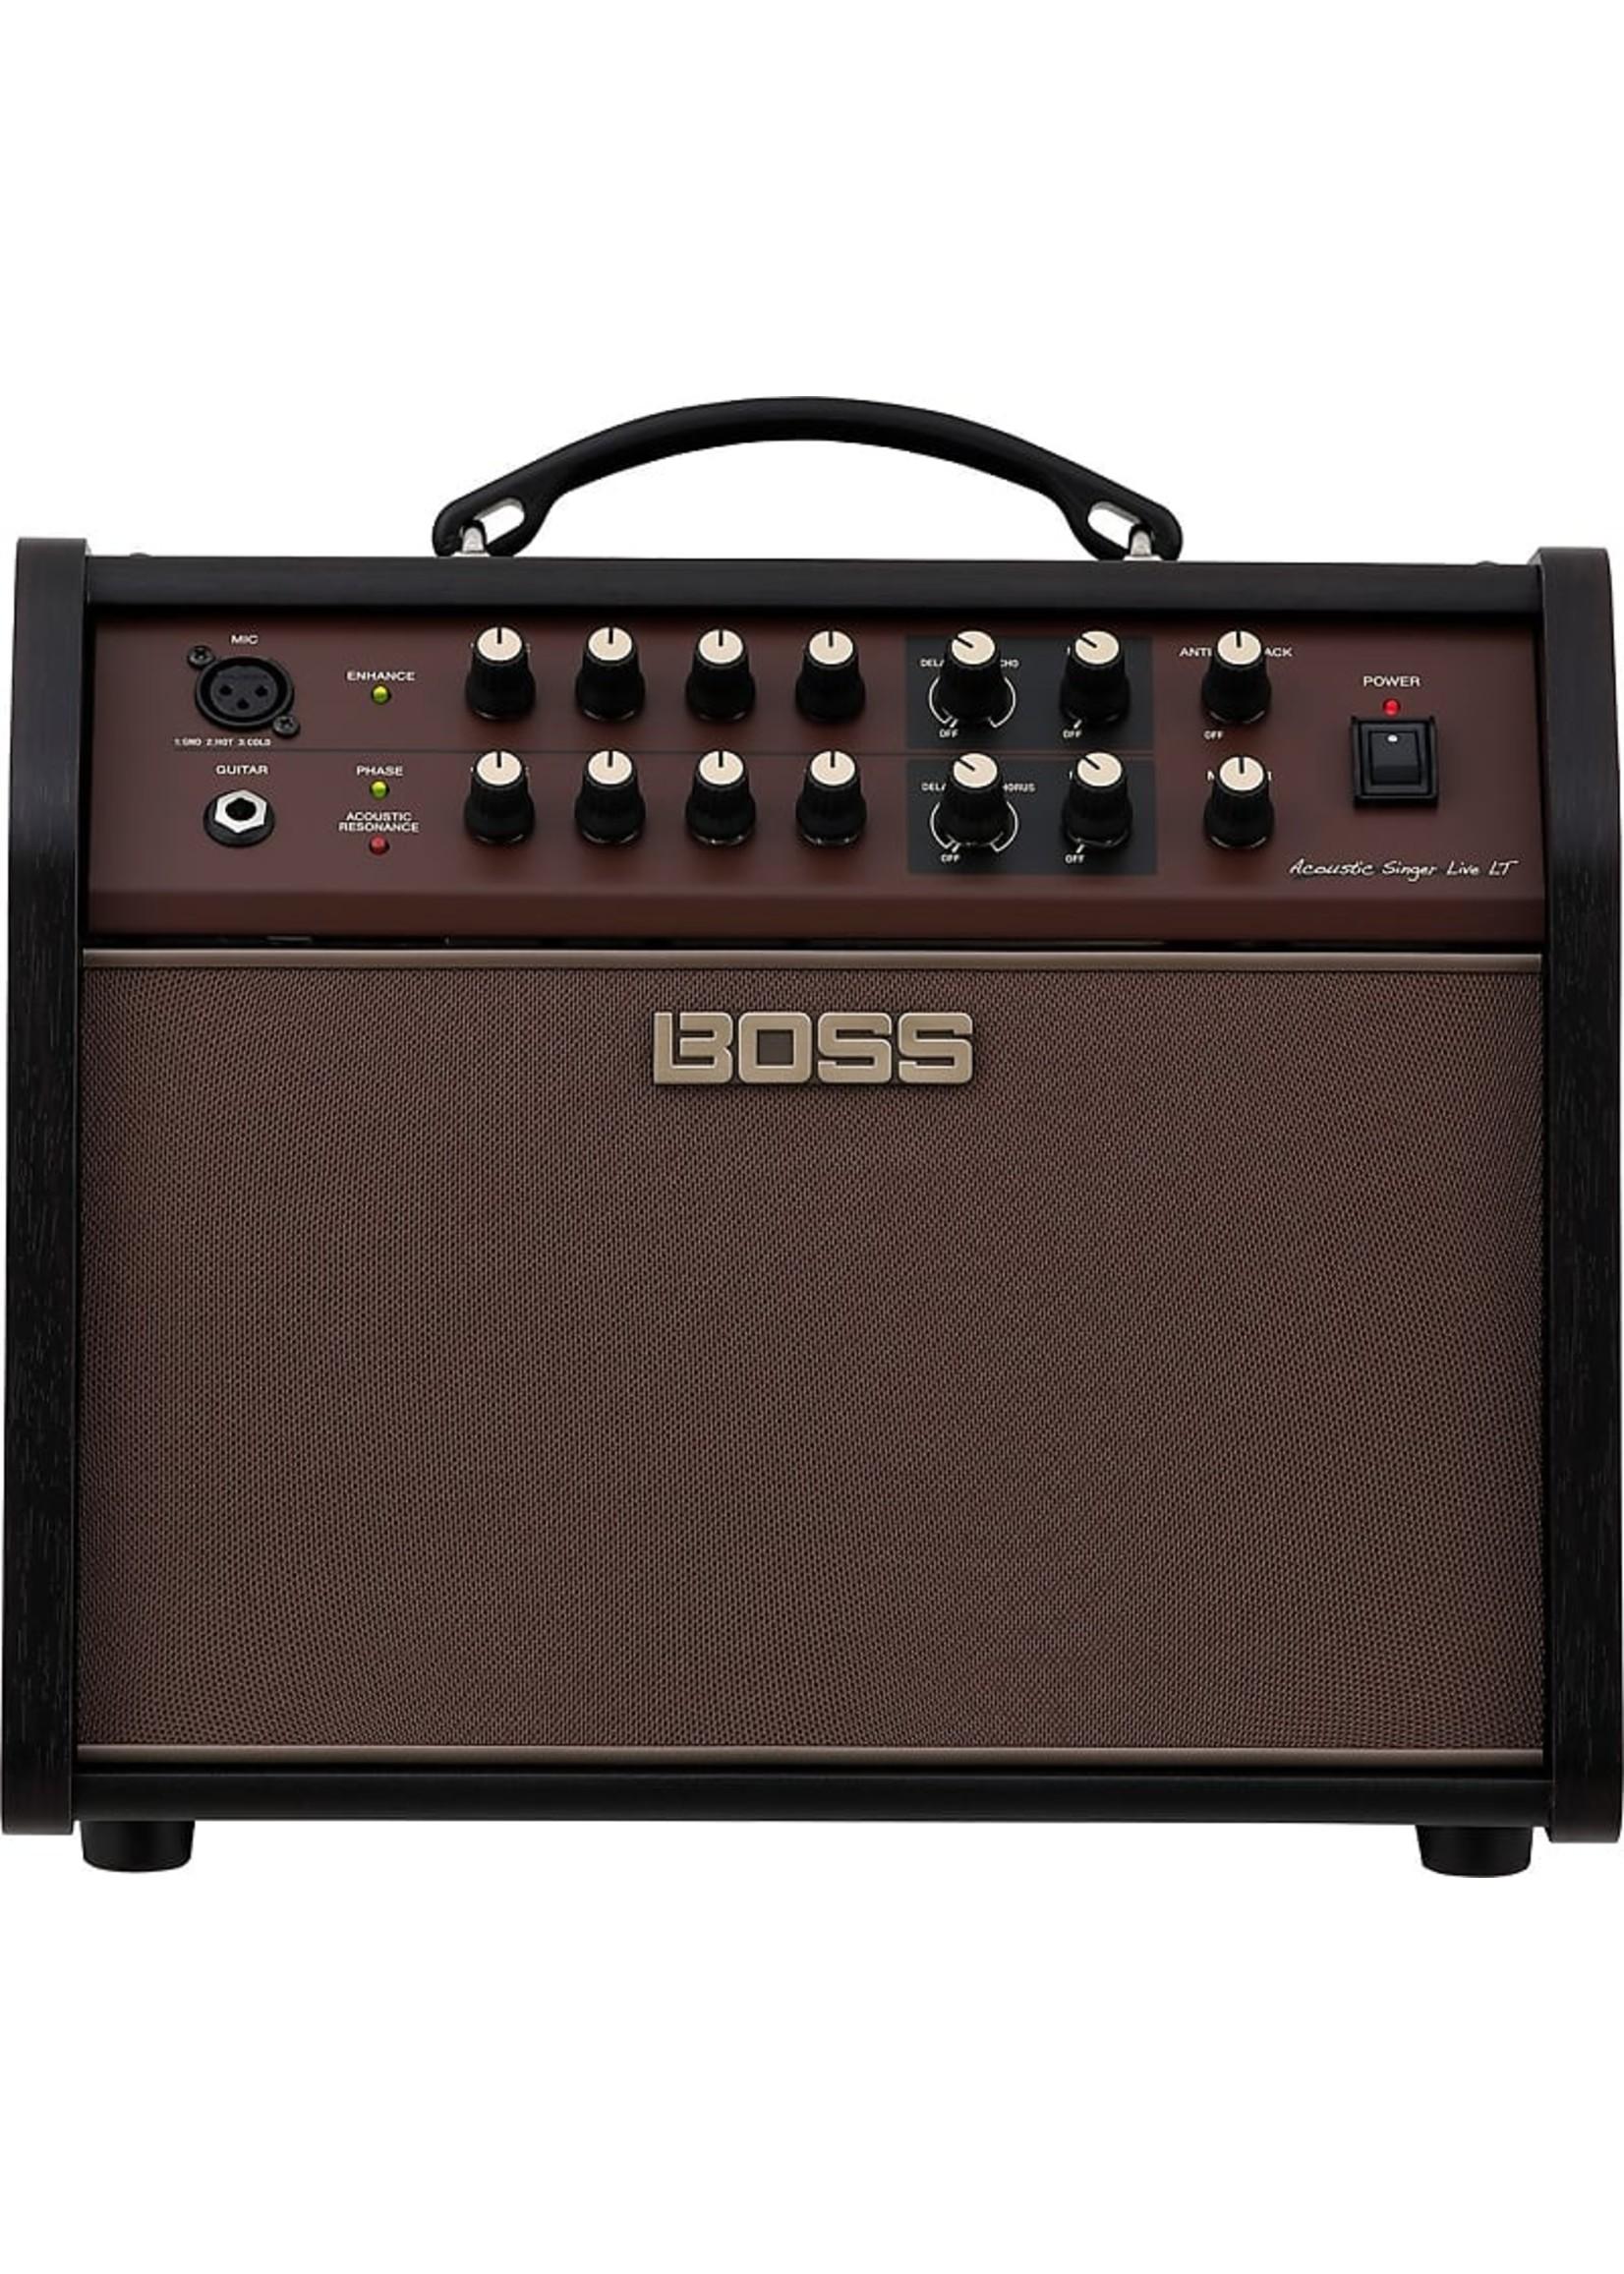 Boss Boss ACS-LIVELT Acoustic Singer Live LT Amplifier